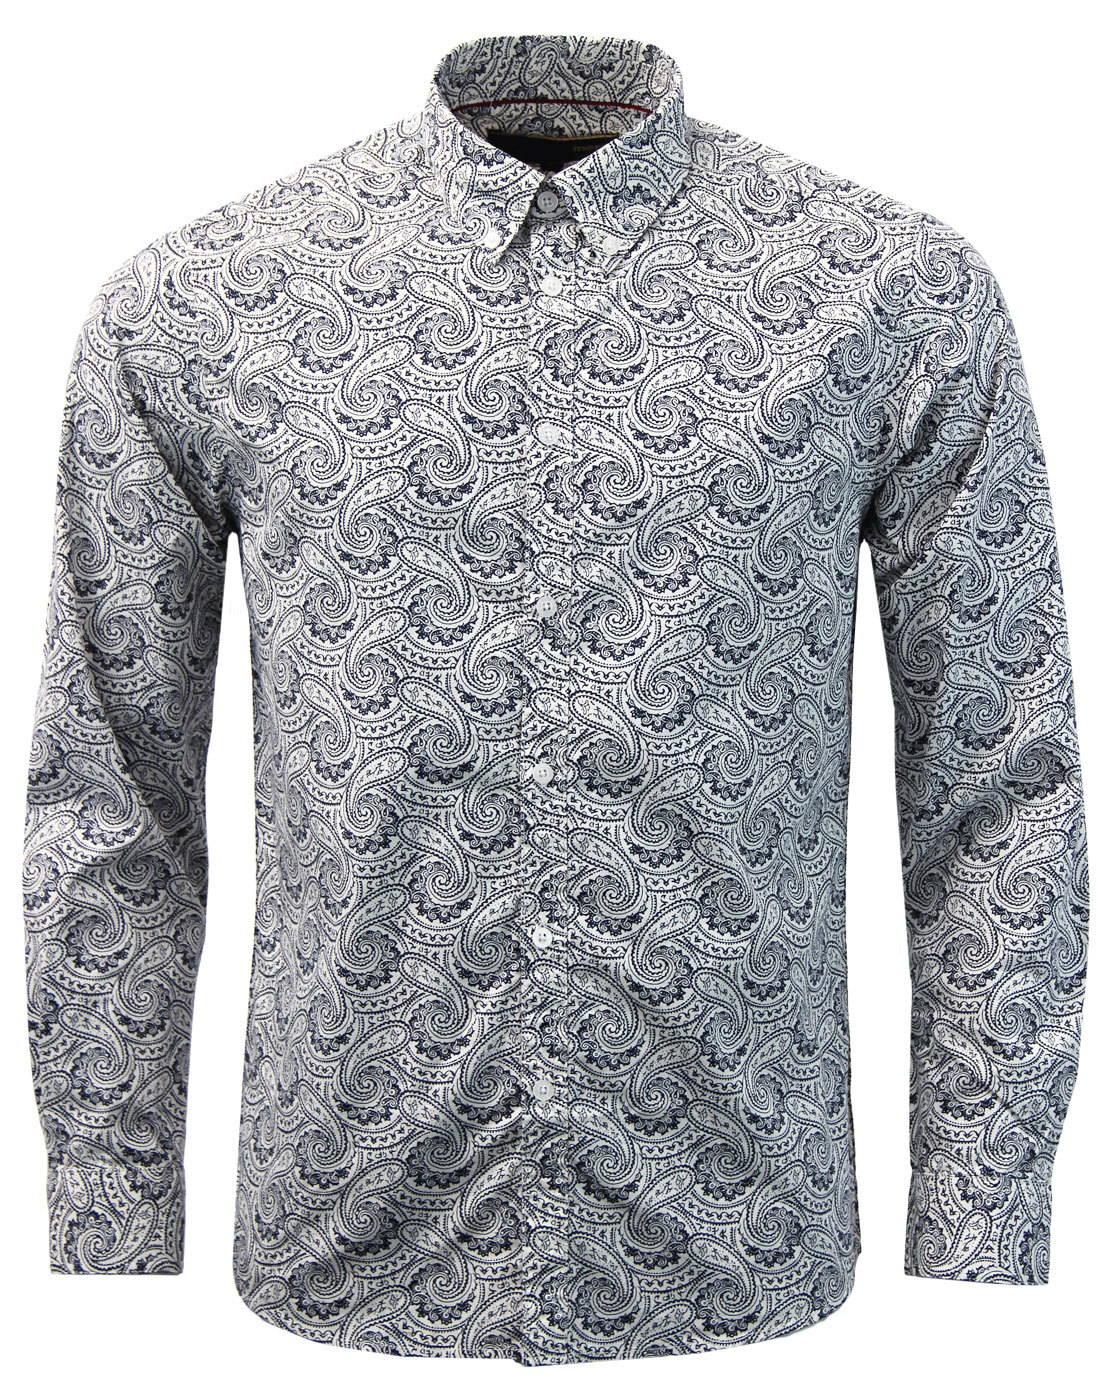 Patcham MERC Retro 60s Mod Monotone Paisley Shirt